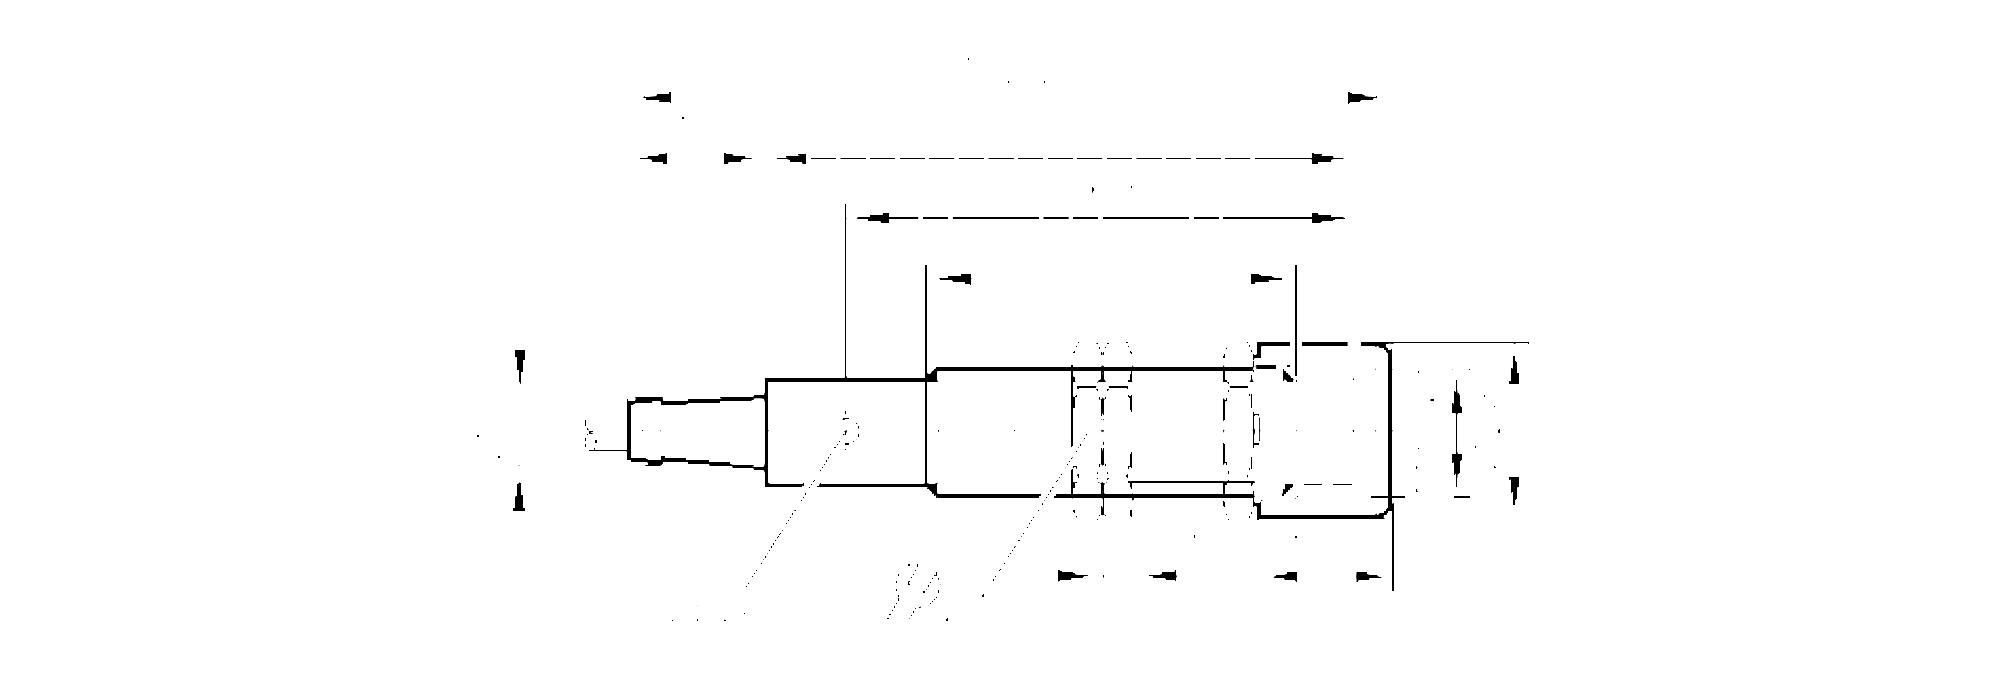 1 x IFM Induktiver Sensor IG513A; IGA 3008-BPKG//3D